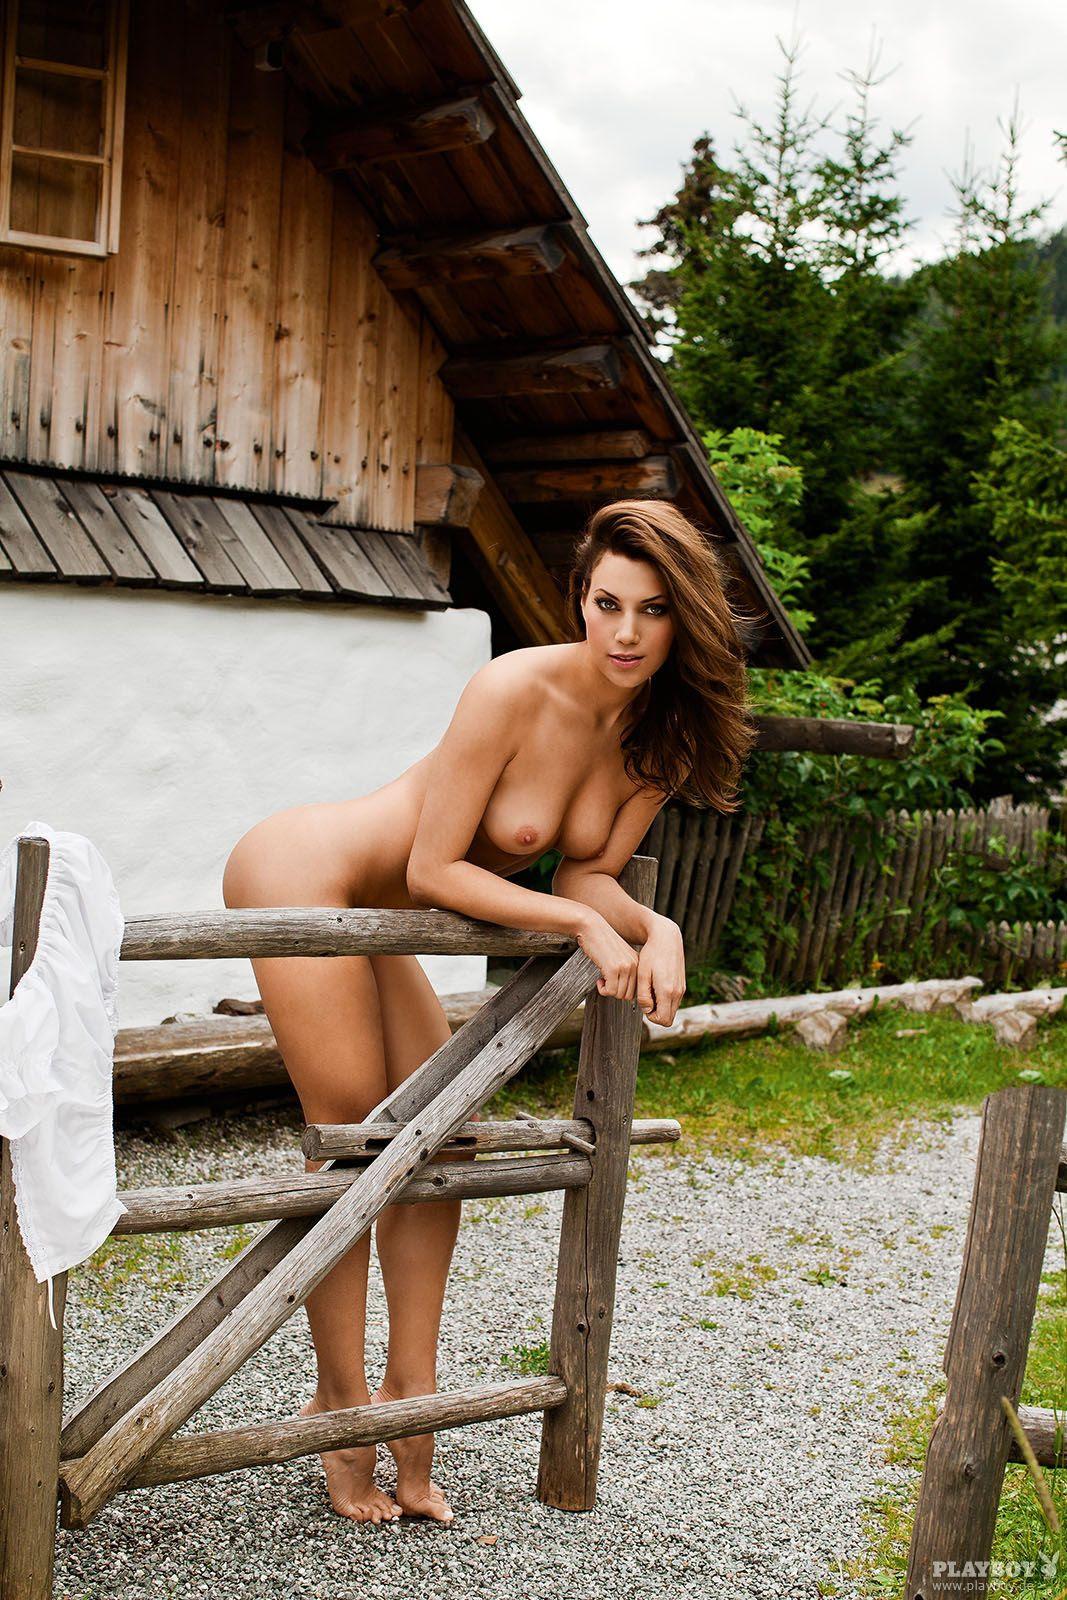 Jessica kühne nackt playboy